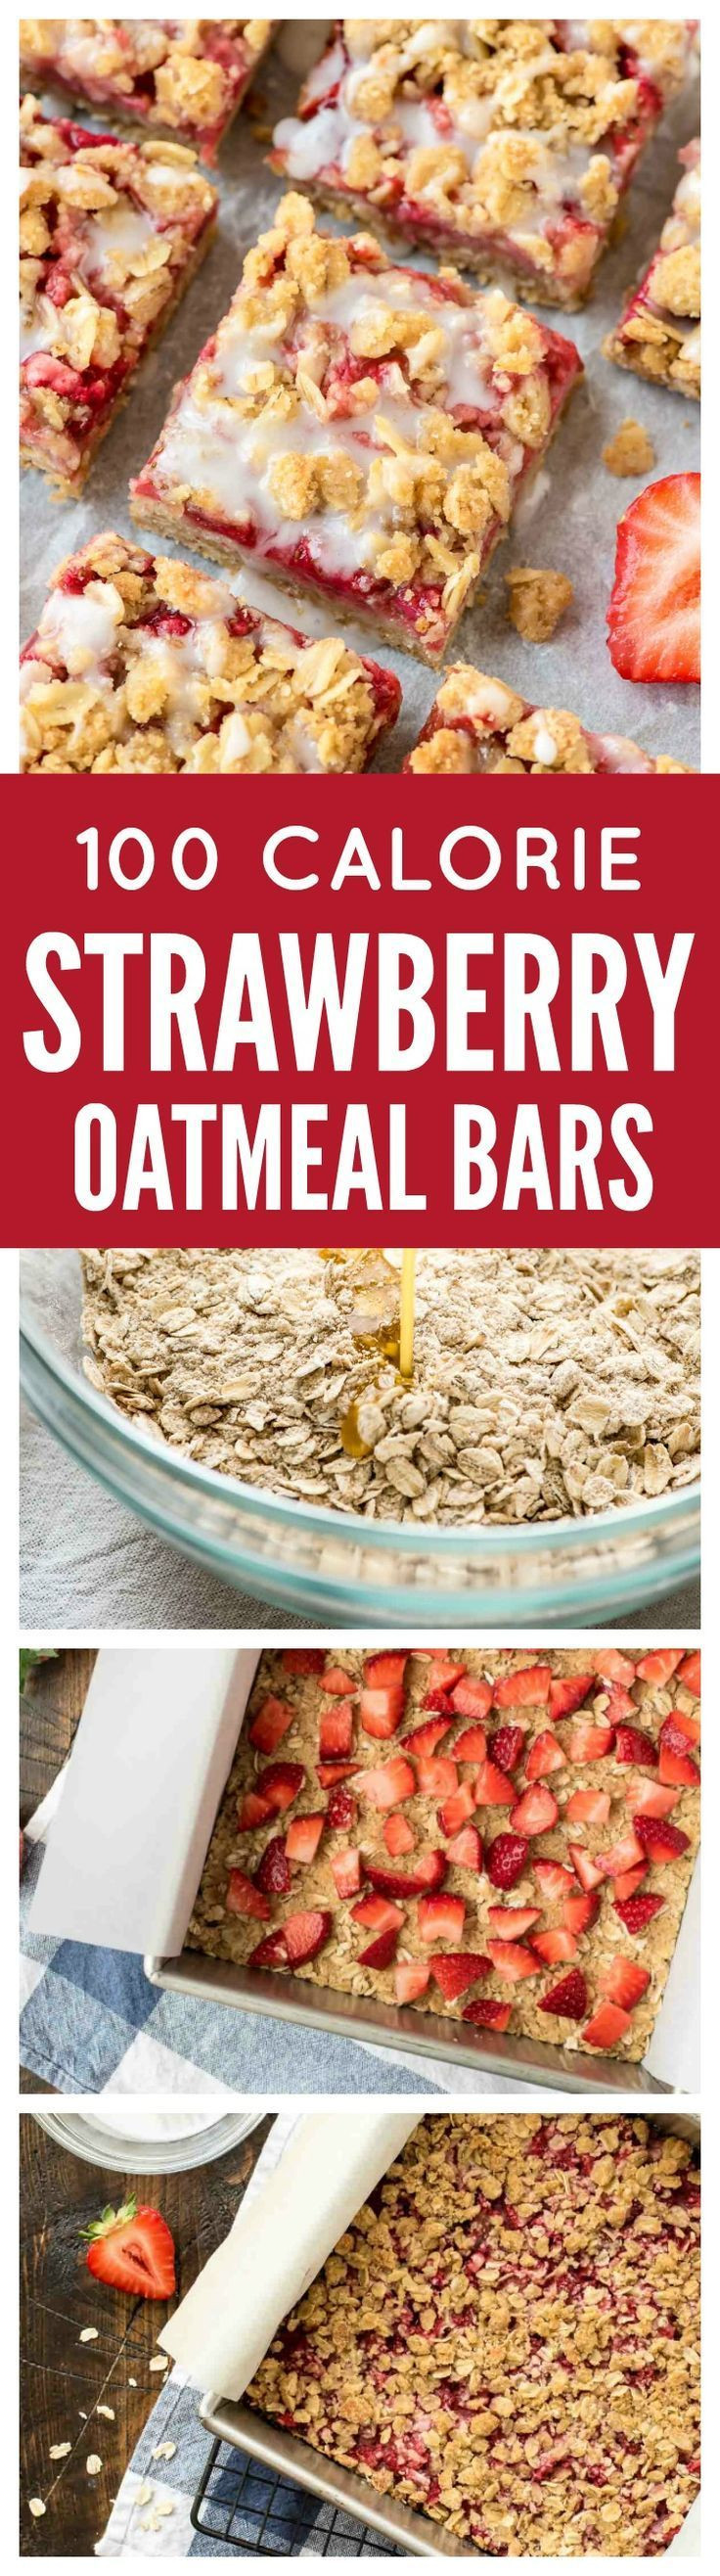 Healthy Potluck Desserts  Best 25 Strawberry Oatmeal Bars ideas on Pinterest